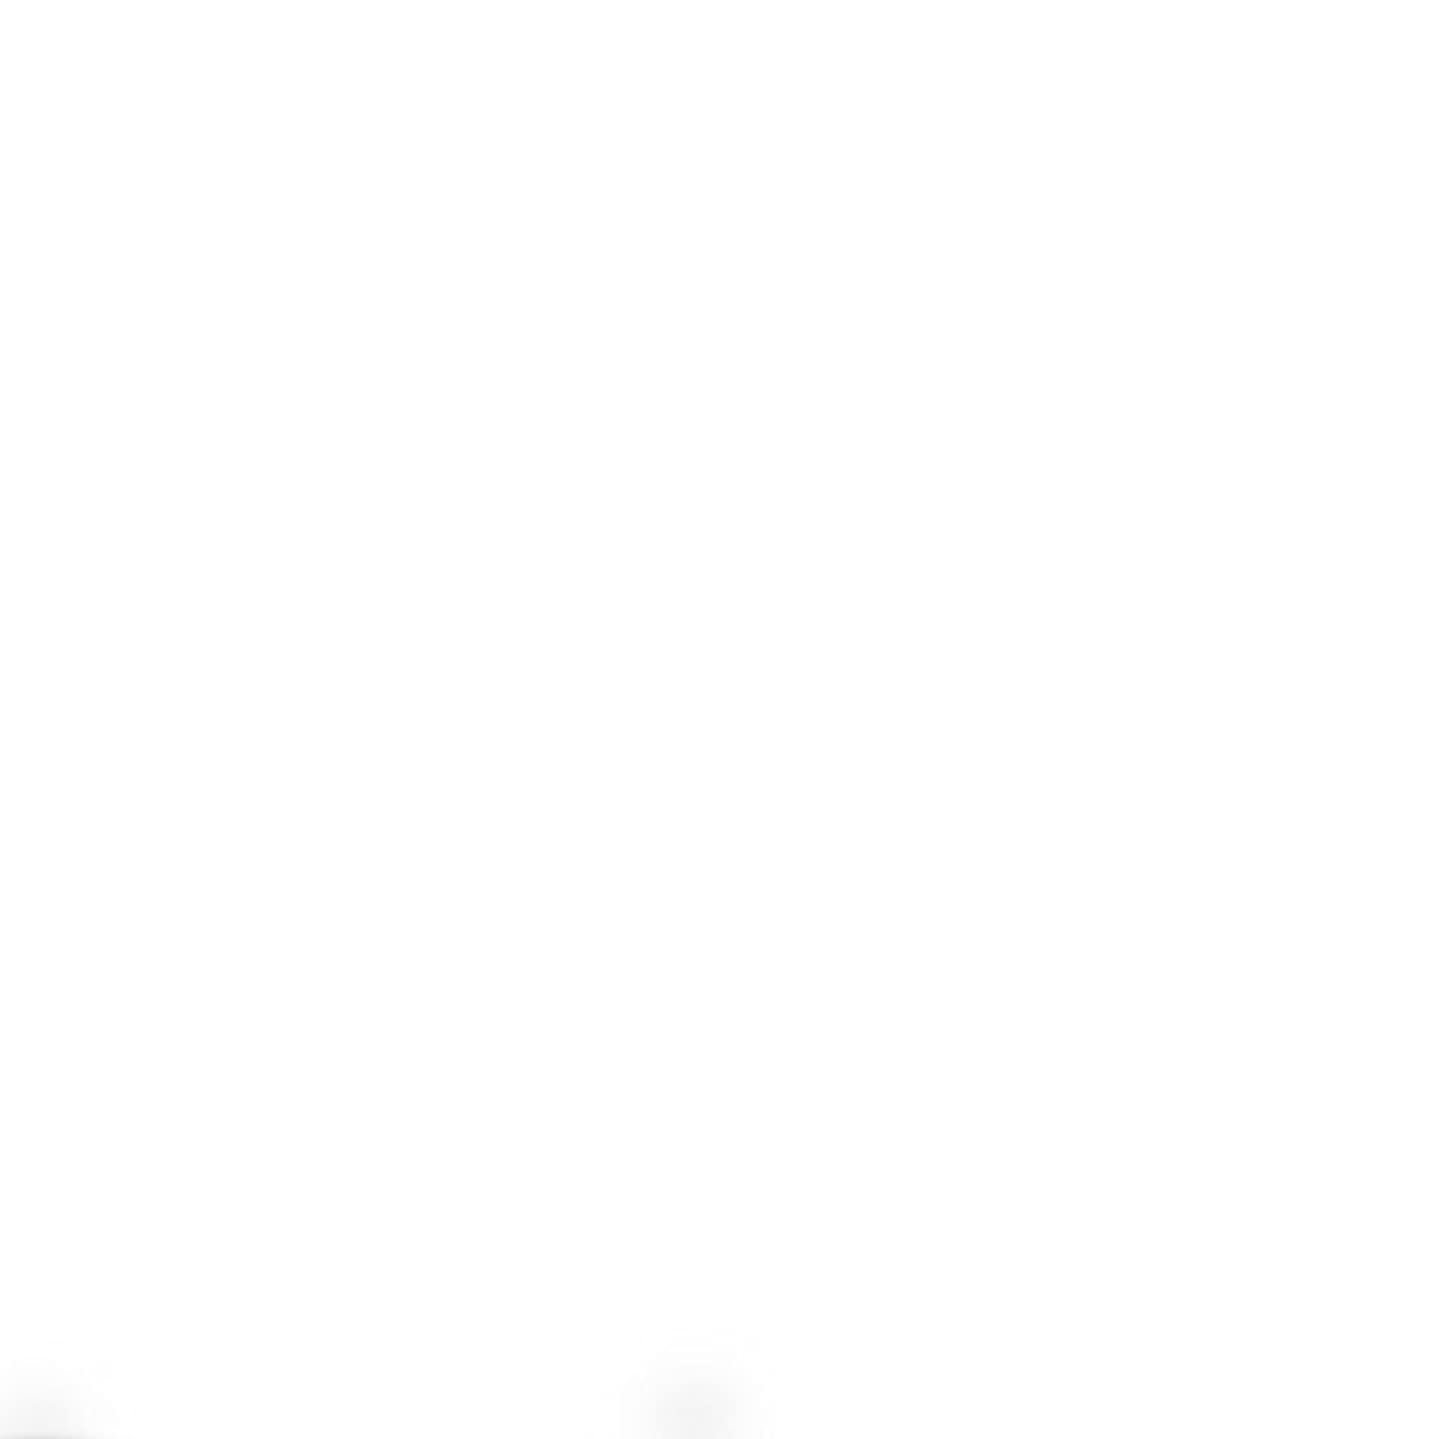 Neutrogena ニュートロジーナ ウェットスキン キッズ 日焼け止めセット (チューブタイプ) [並行輸入品]